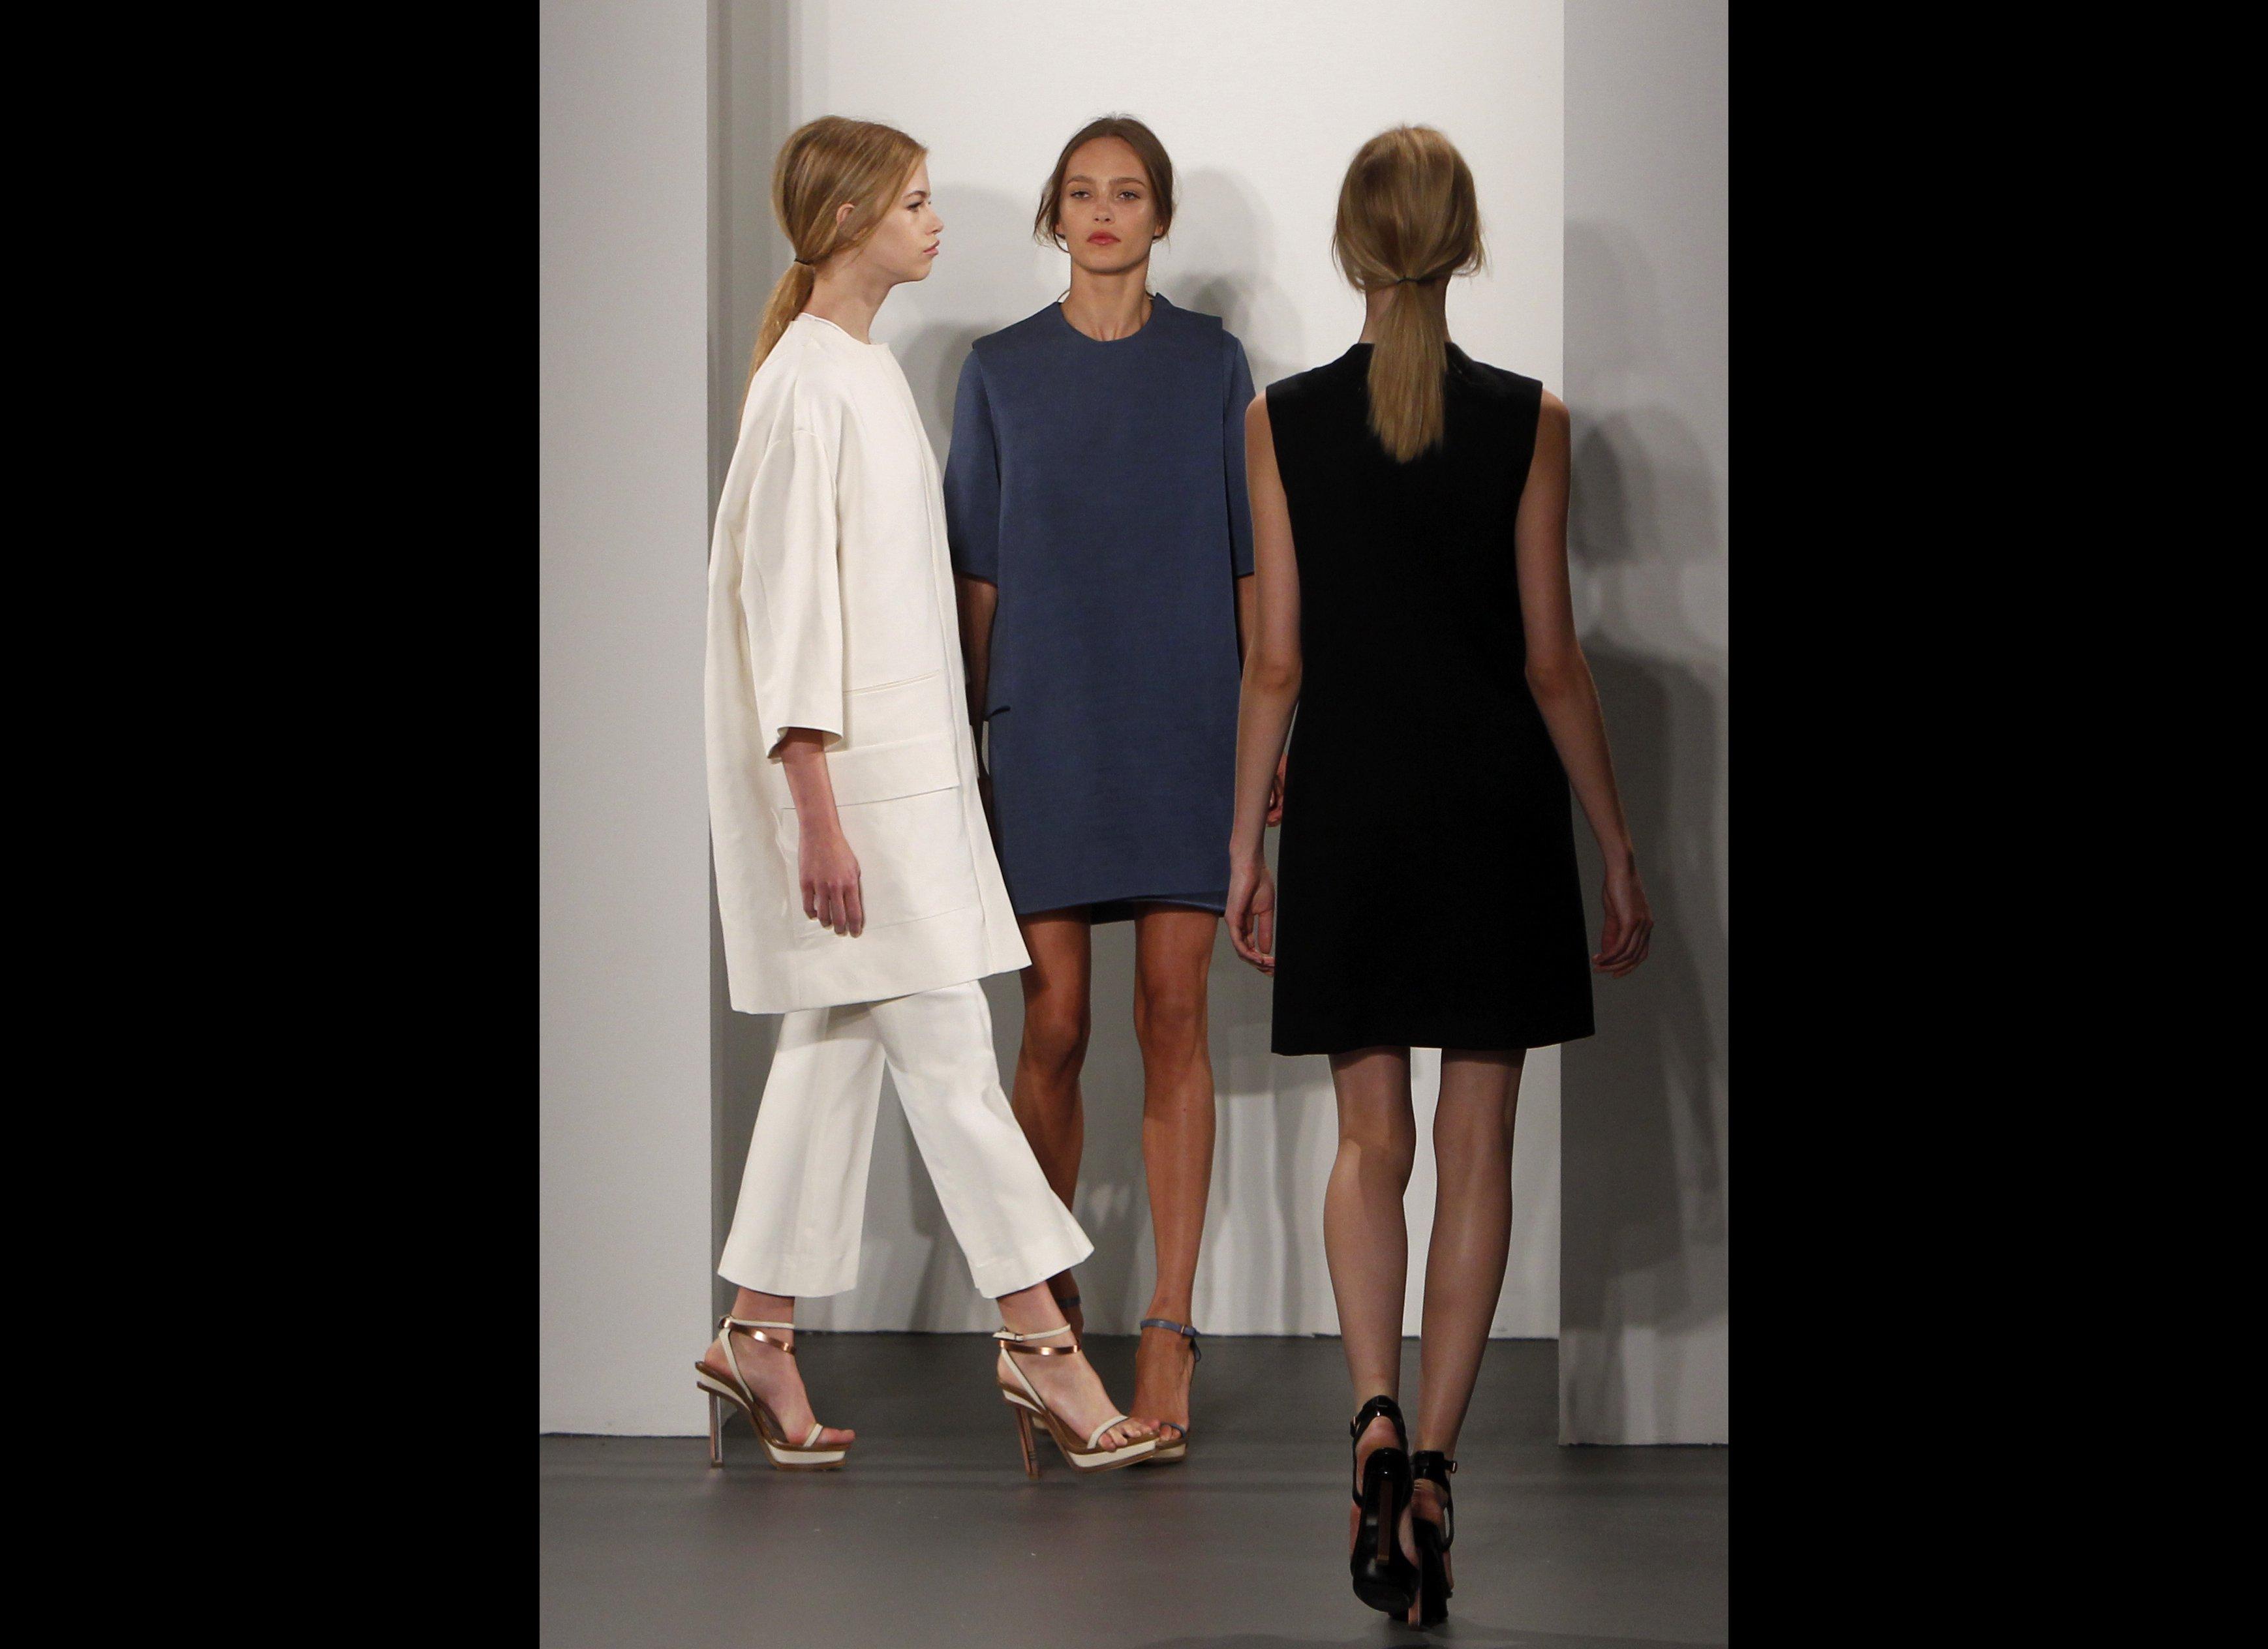 Calvin Klein Male Models 1980s - Viewing Gallery Mark Wahlberg